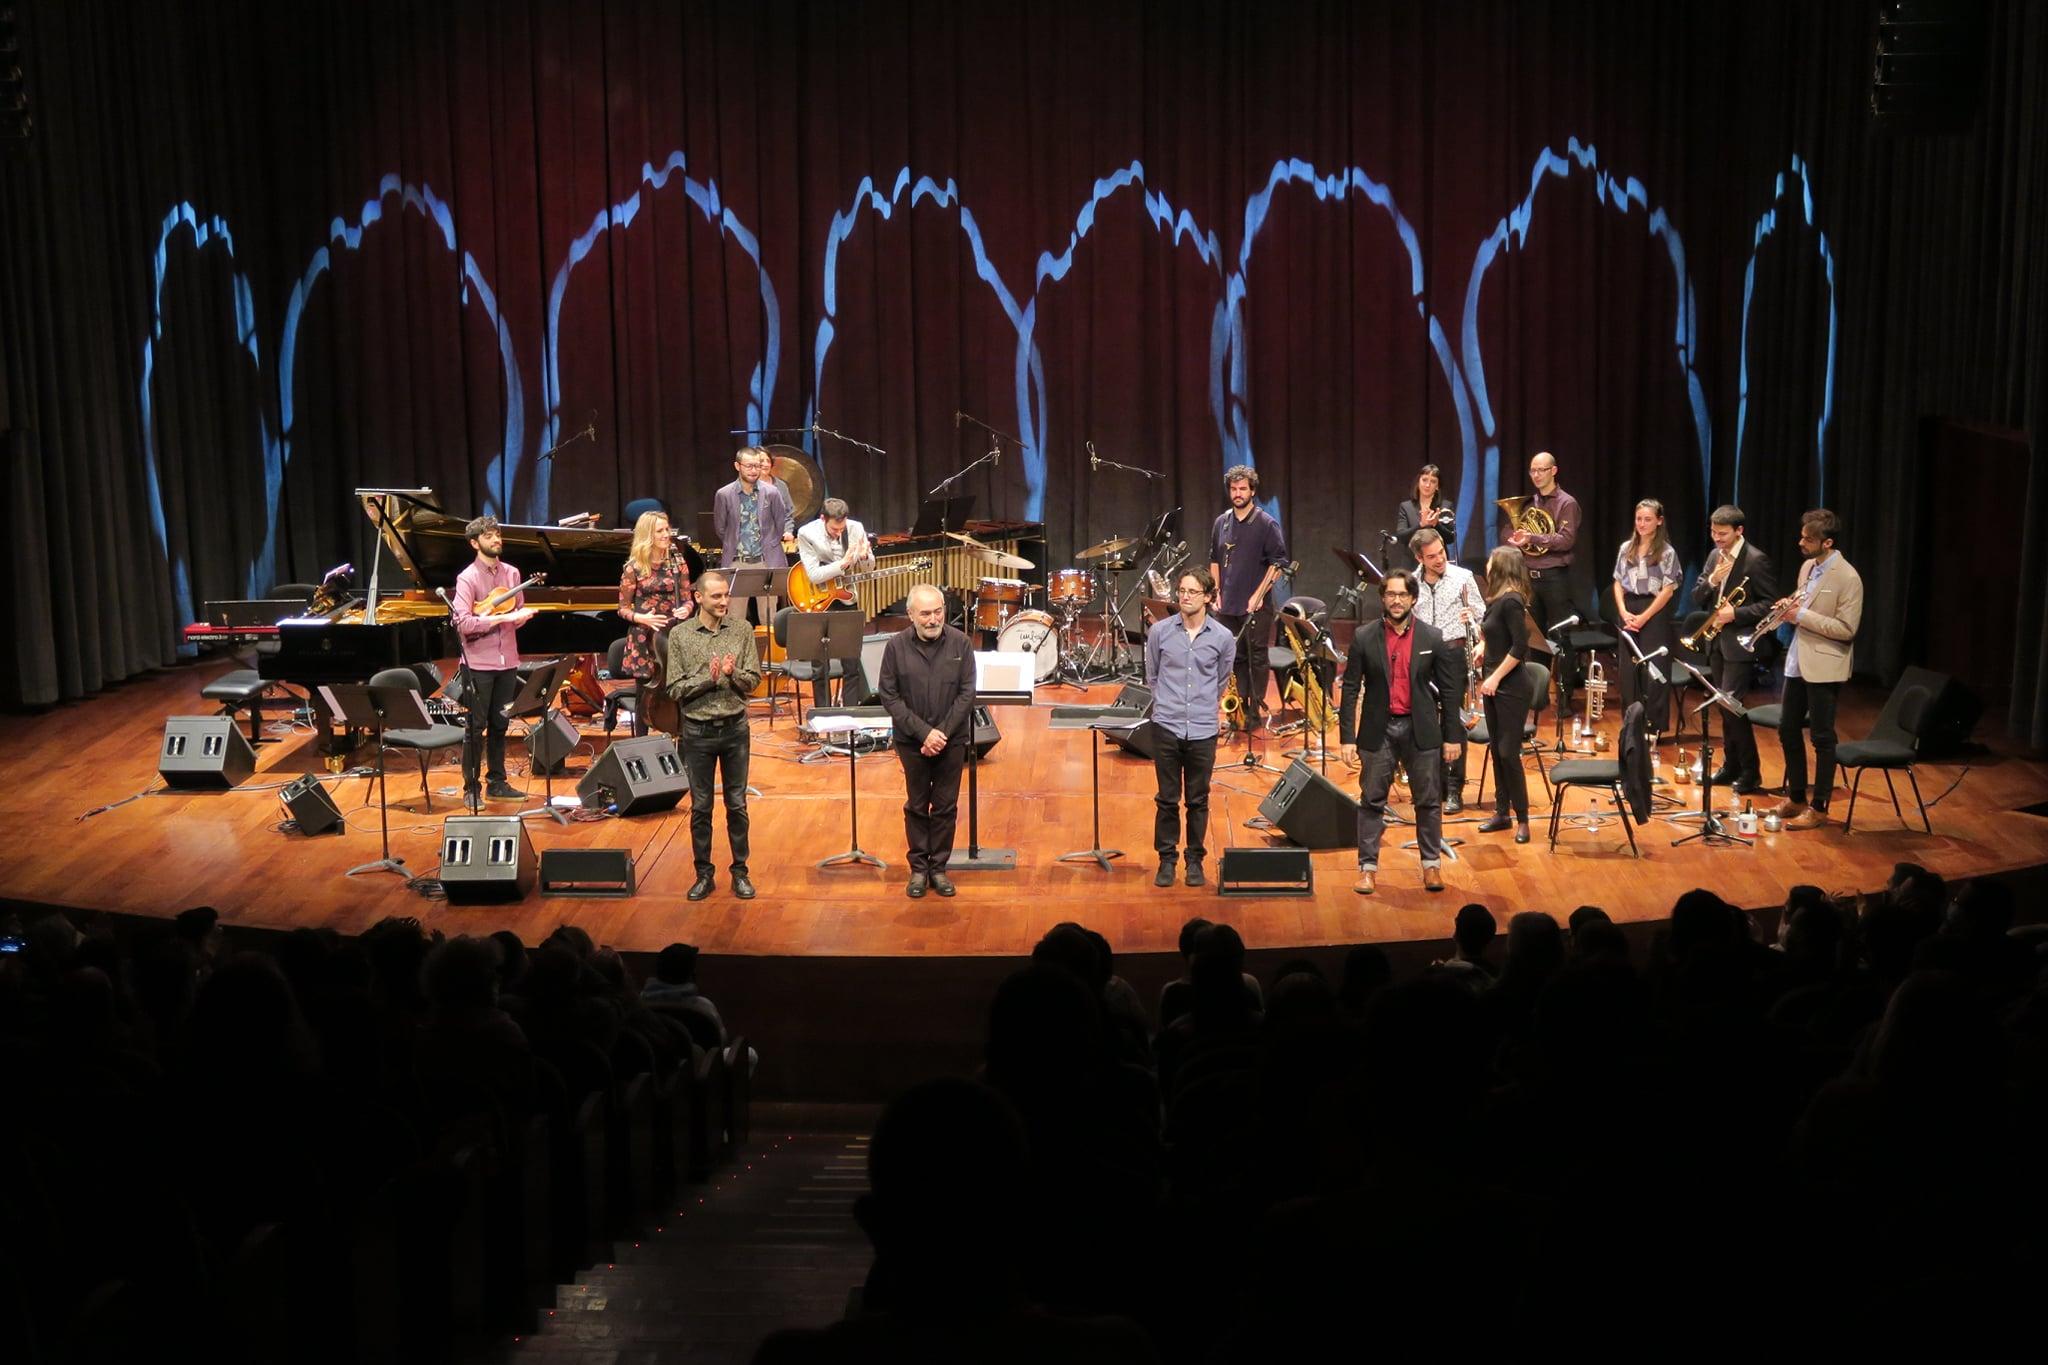 Barcelona Art Orchestra